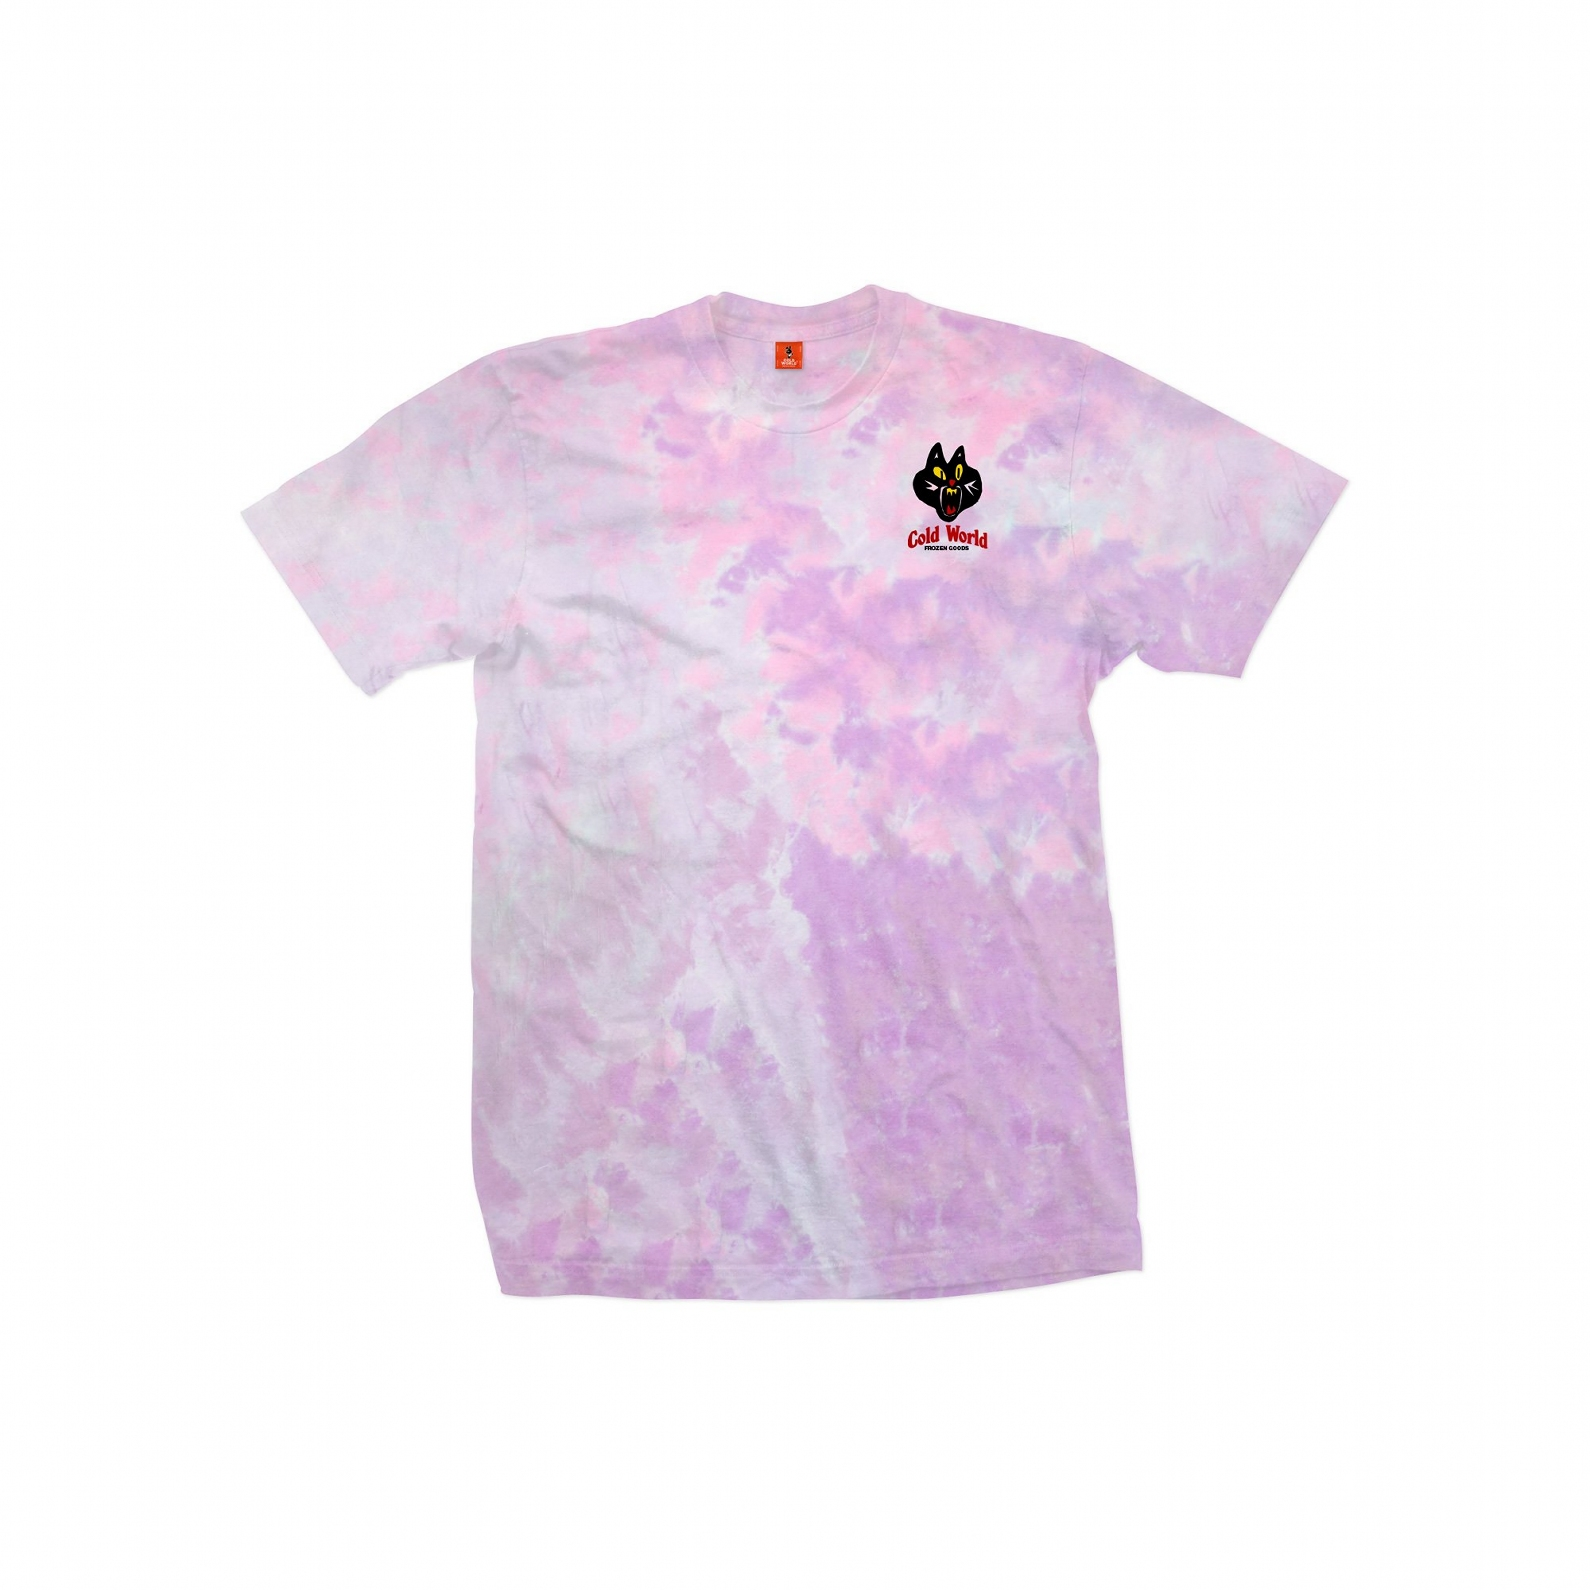 【COLD WORLD FROZEN GOODS/コールドワールドフローズングッズ】JAZZ CAT T-SHIRT Tシャツ / COTTON CANDY TIE DYE